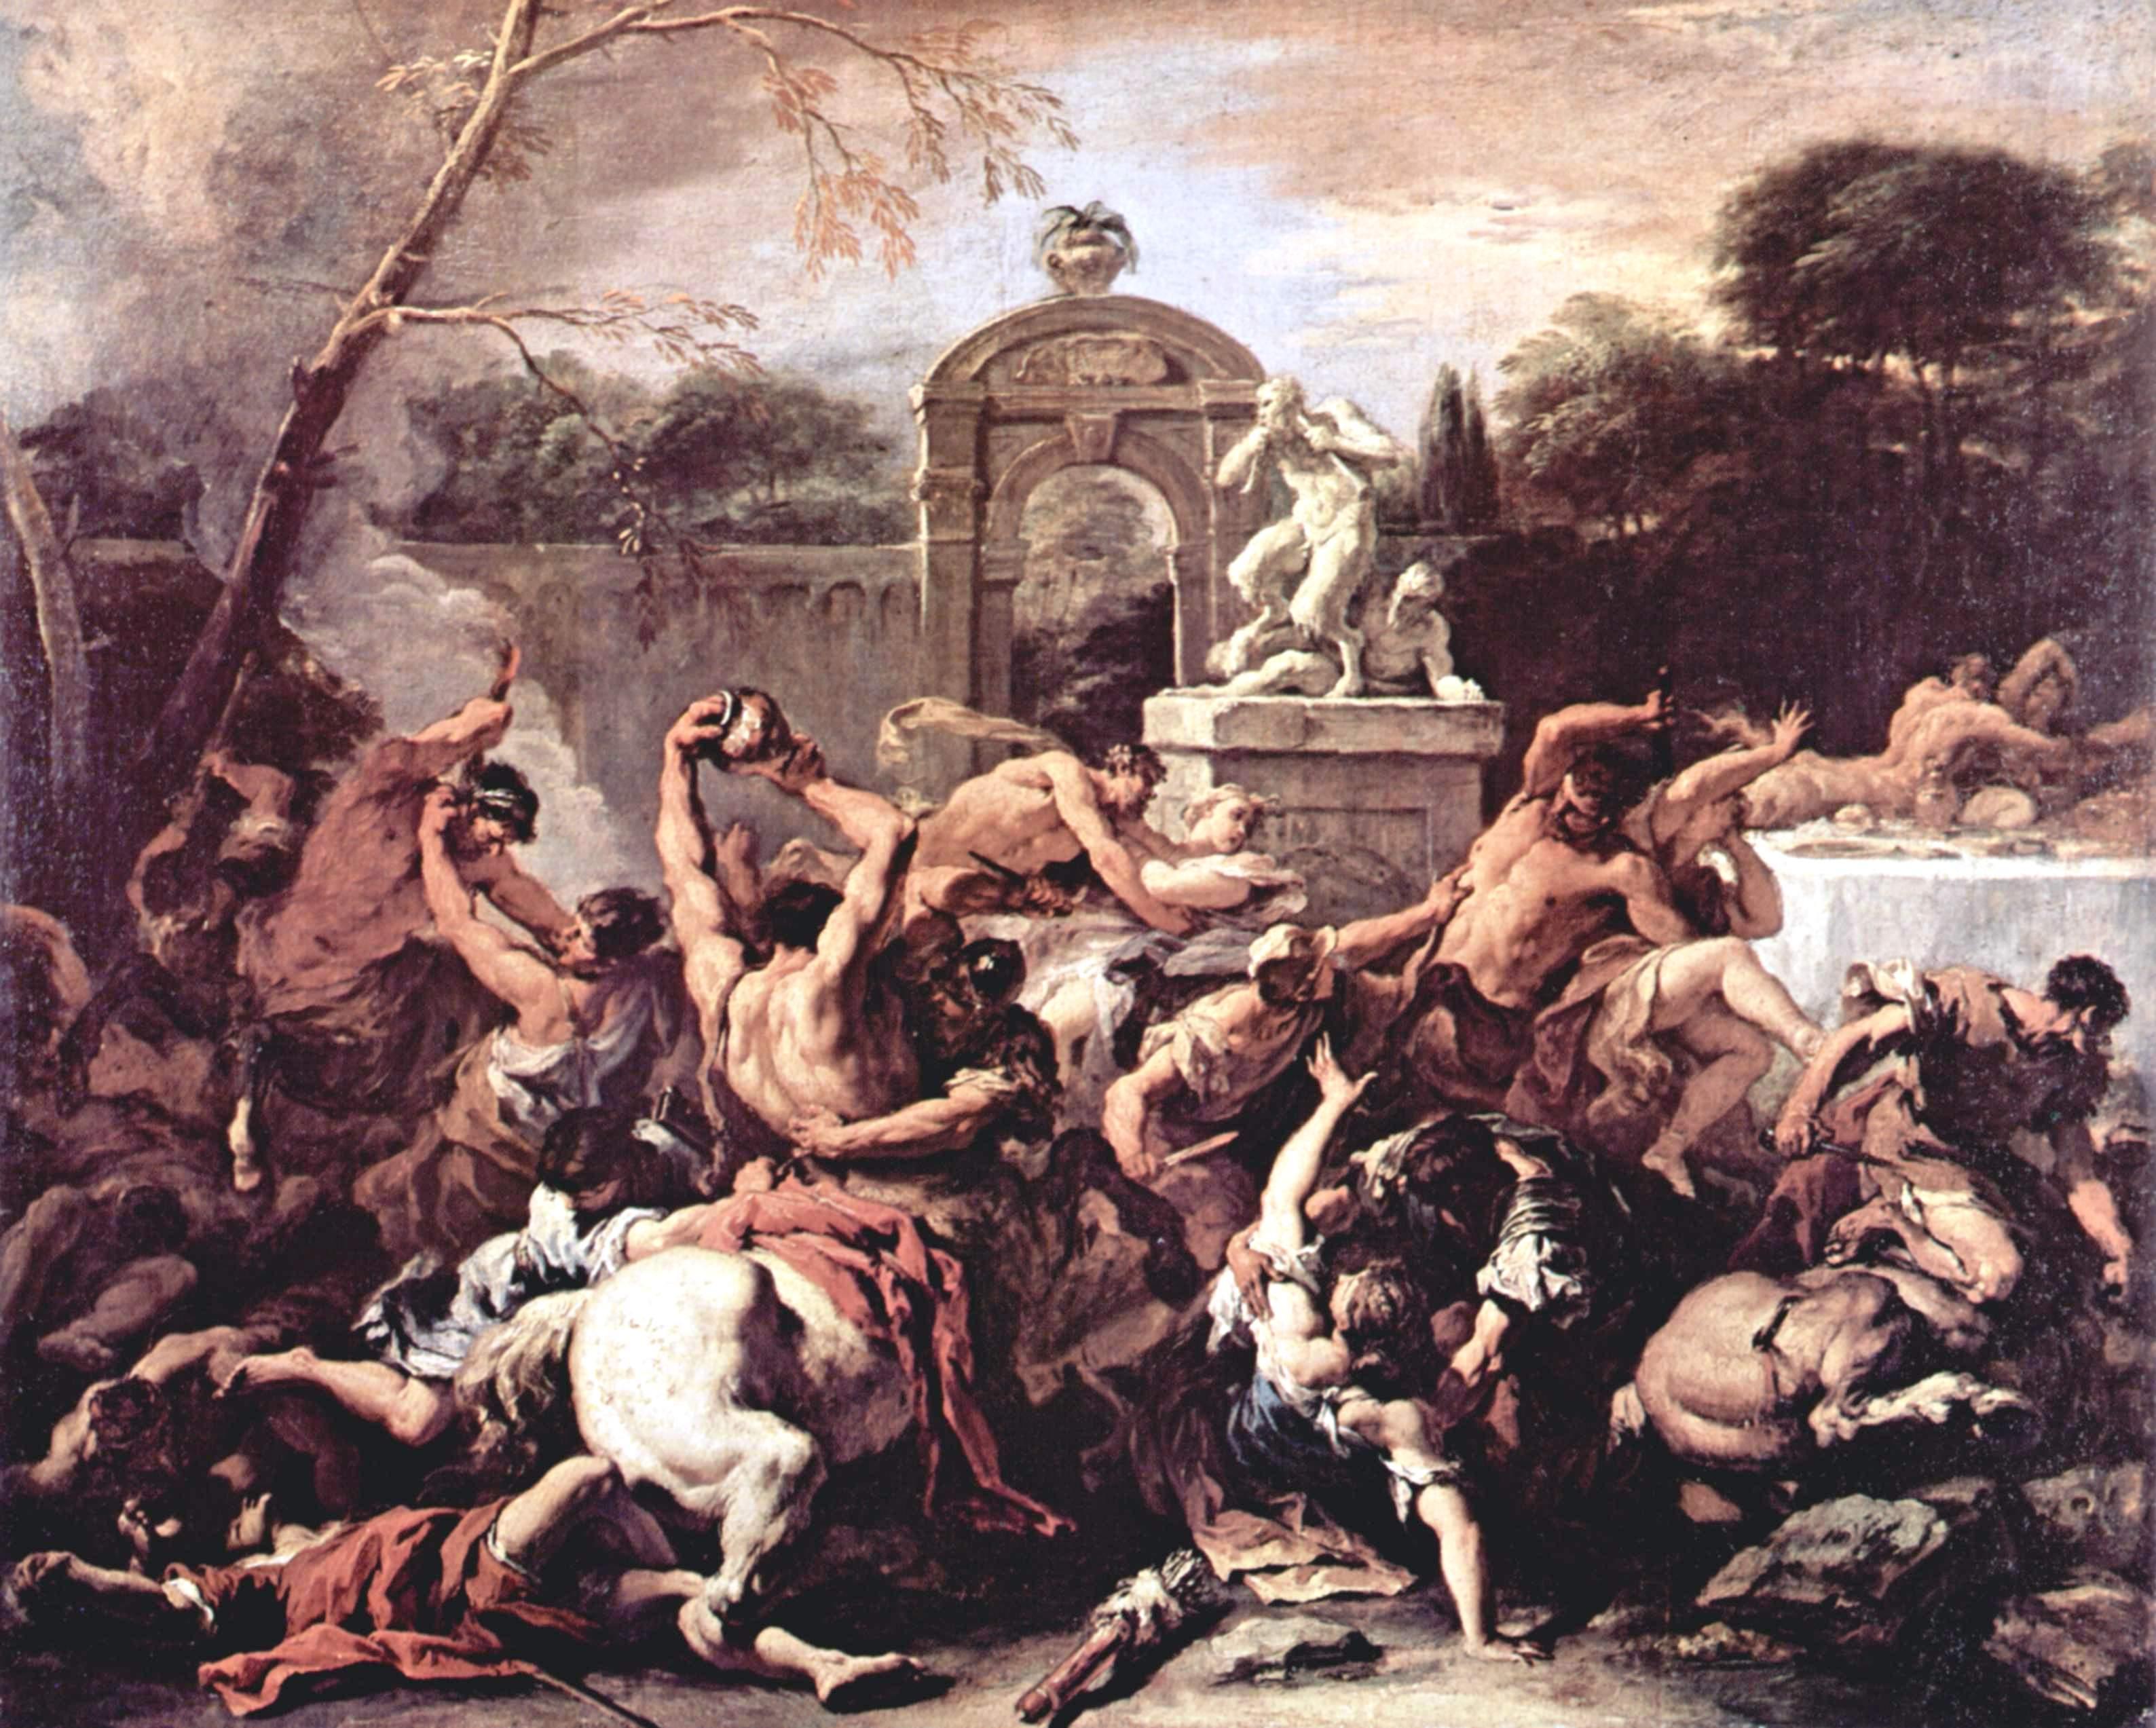 HQ Centaur Wallpapers | File 639.17Kb